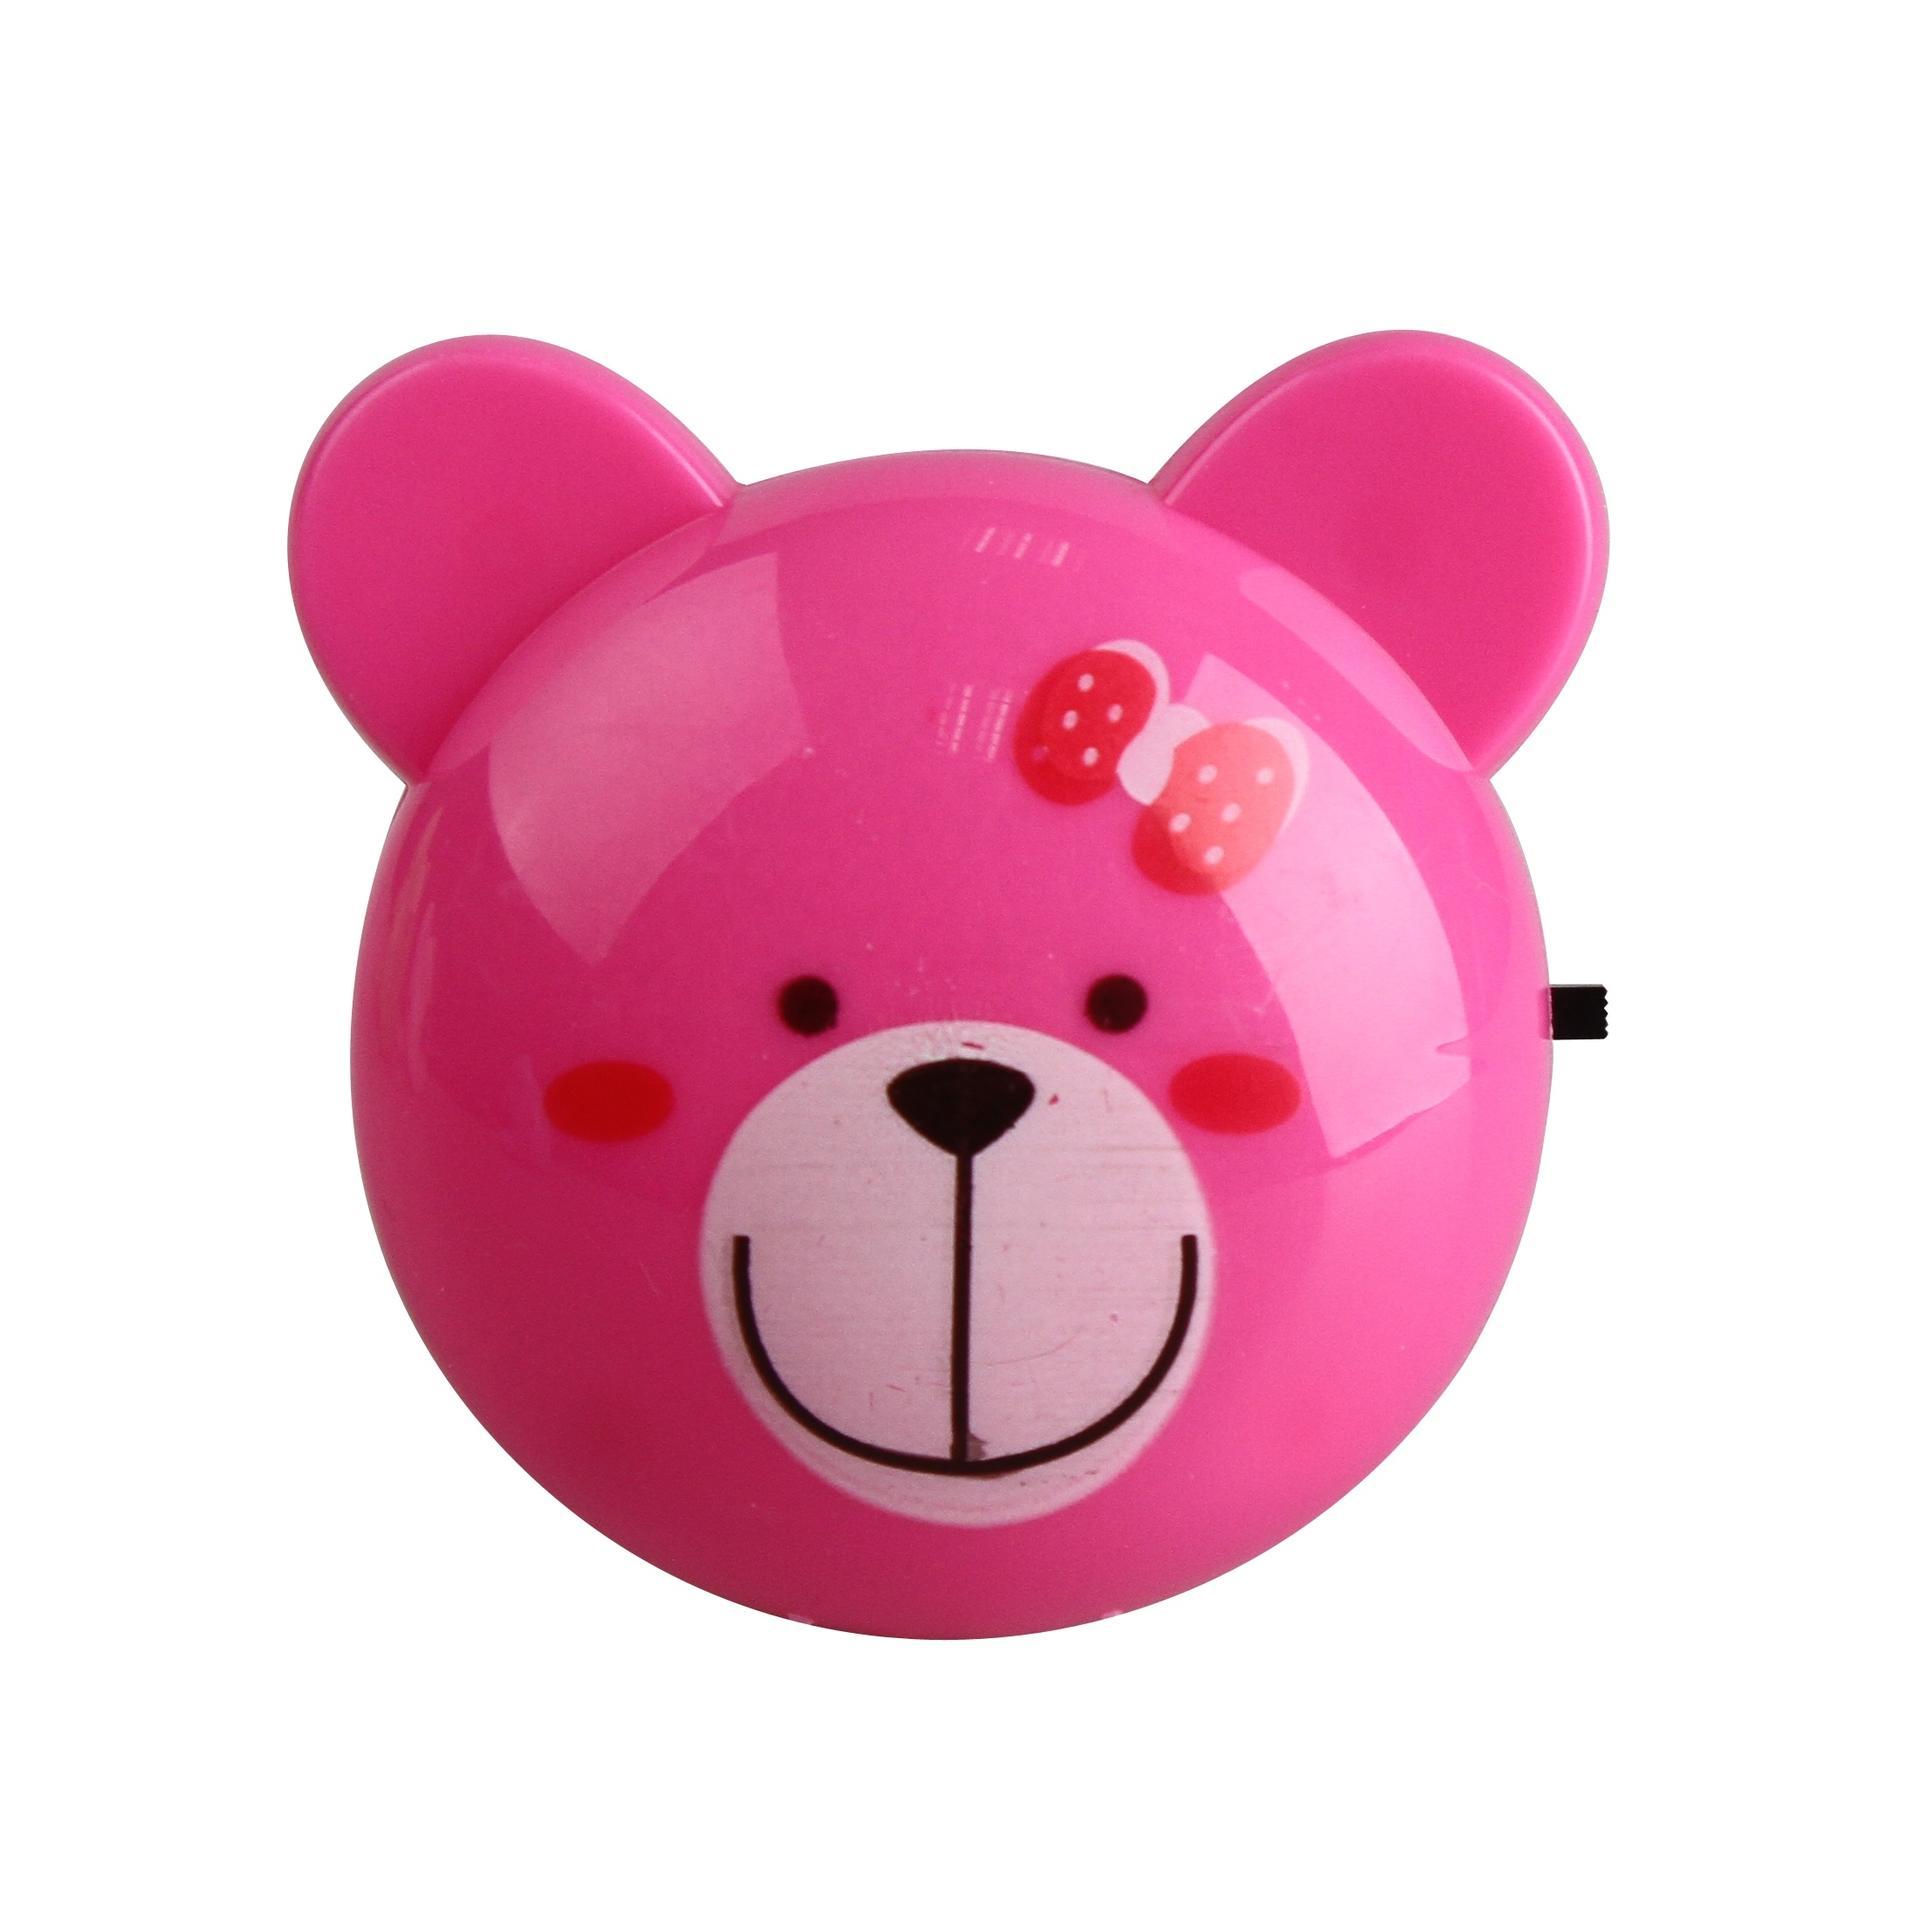 bear head shape 4 SMD mini switch plug in night light 0.6W AC 110V 220V W061